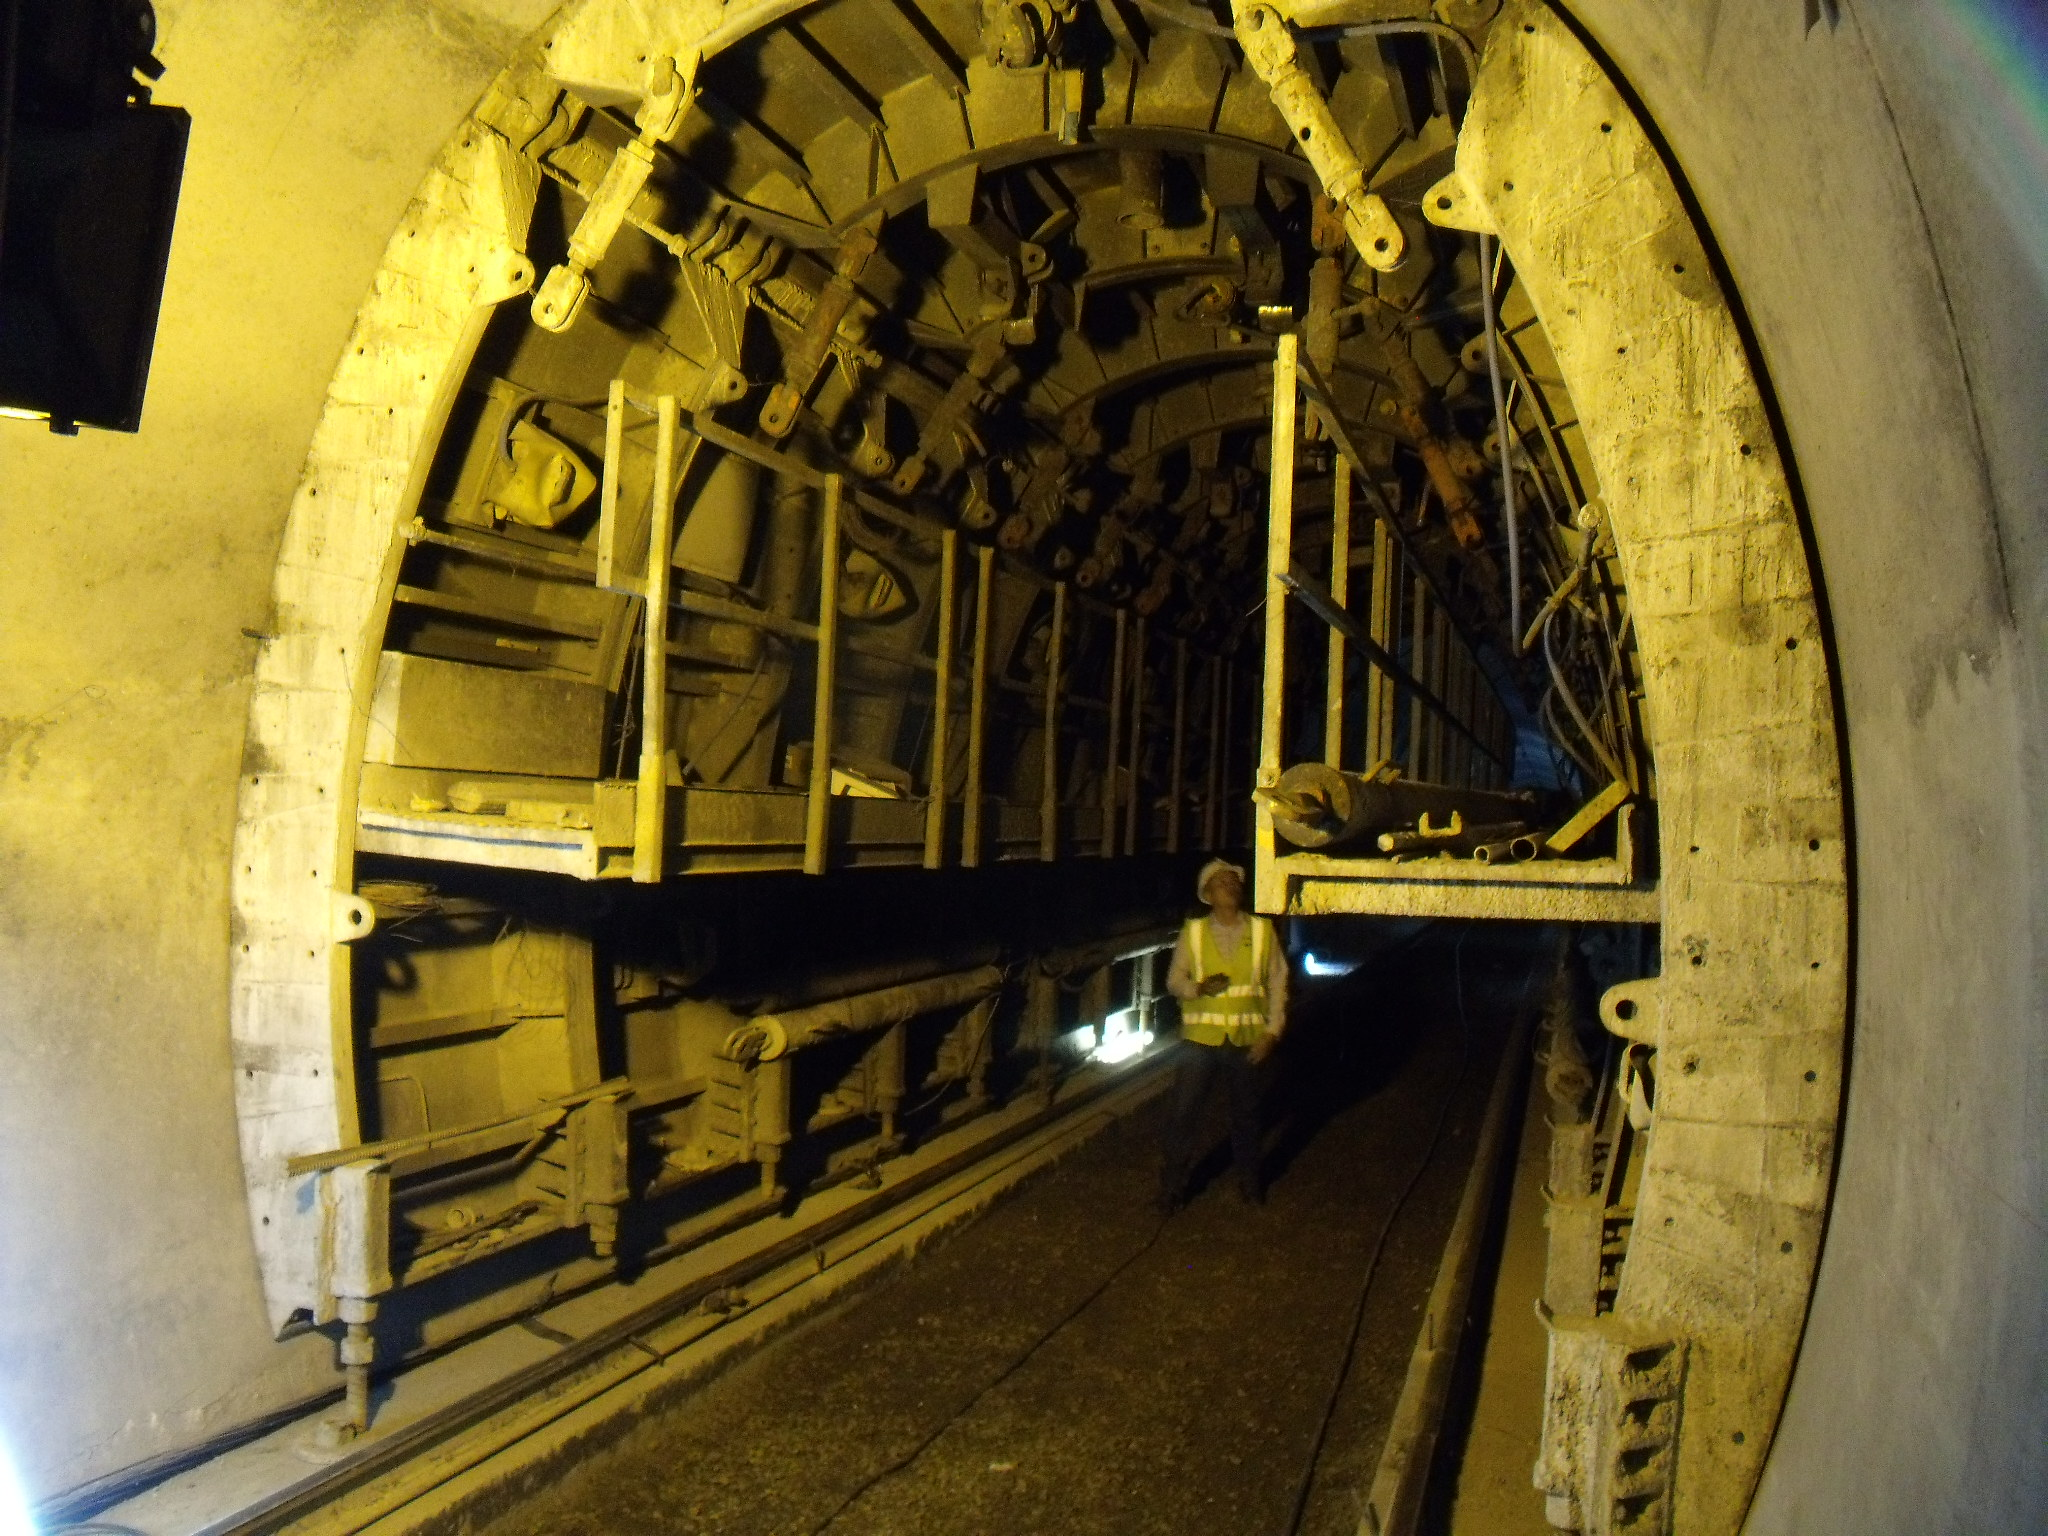 Bored tunnels formwork Piloto de la Línea by RÚBRICA TUNNELS